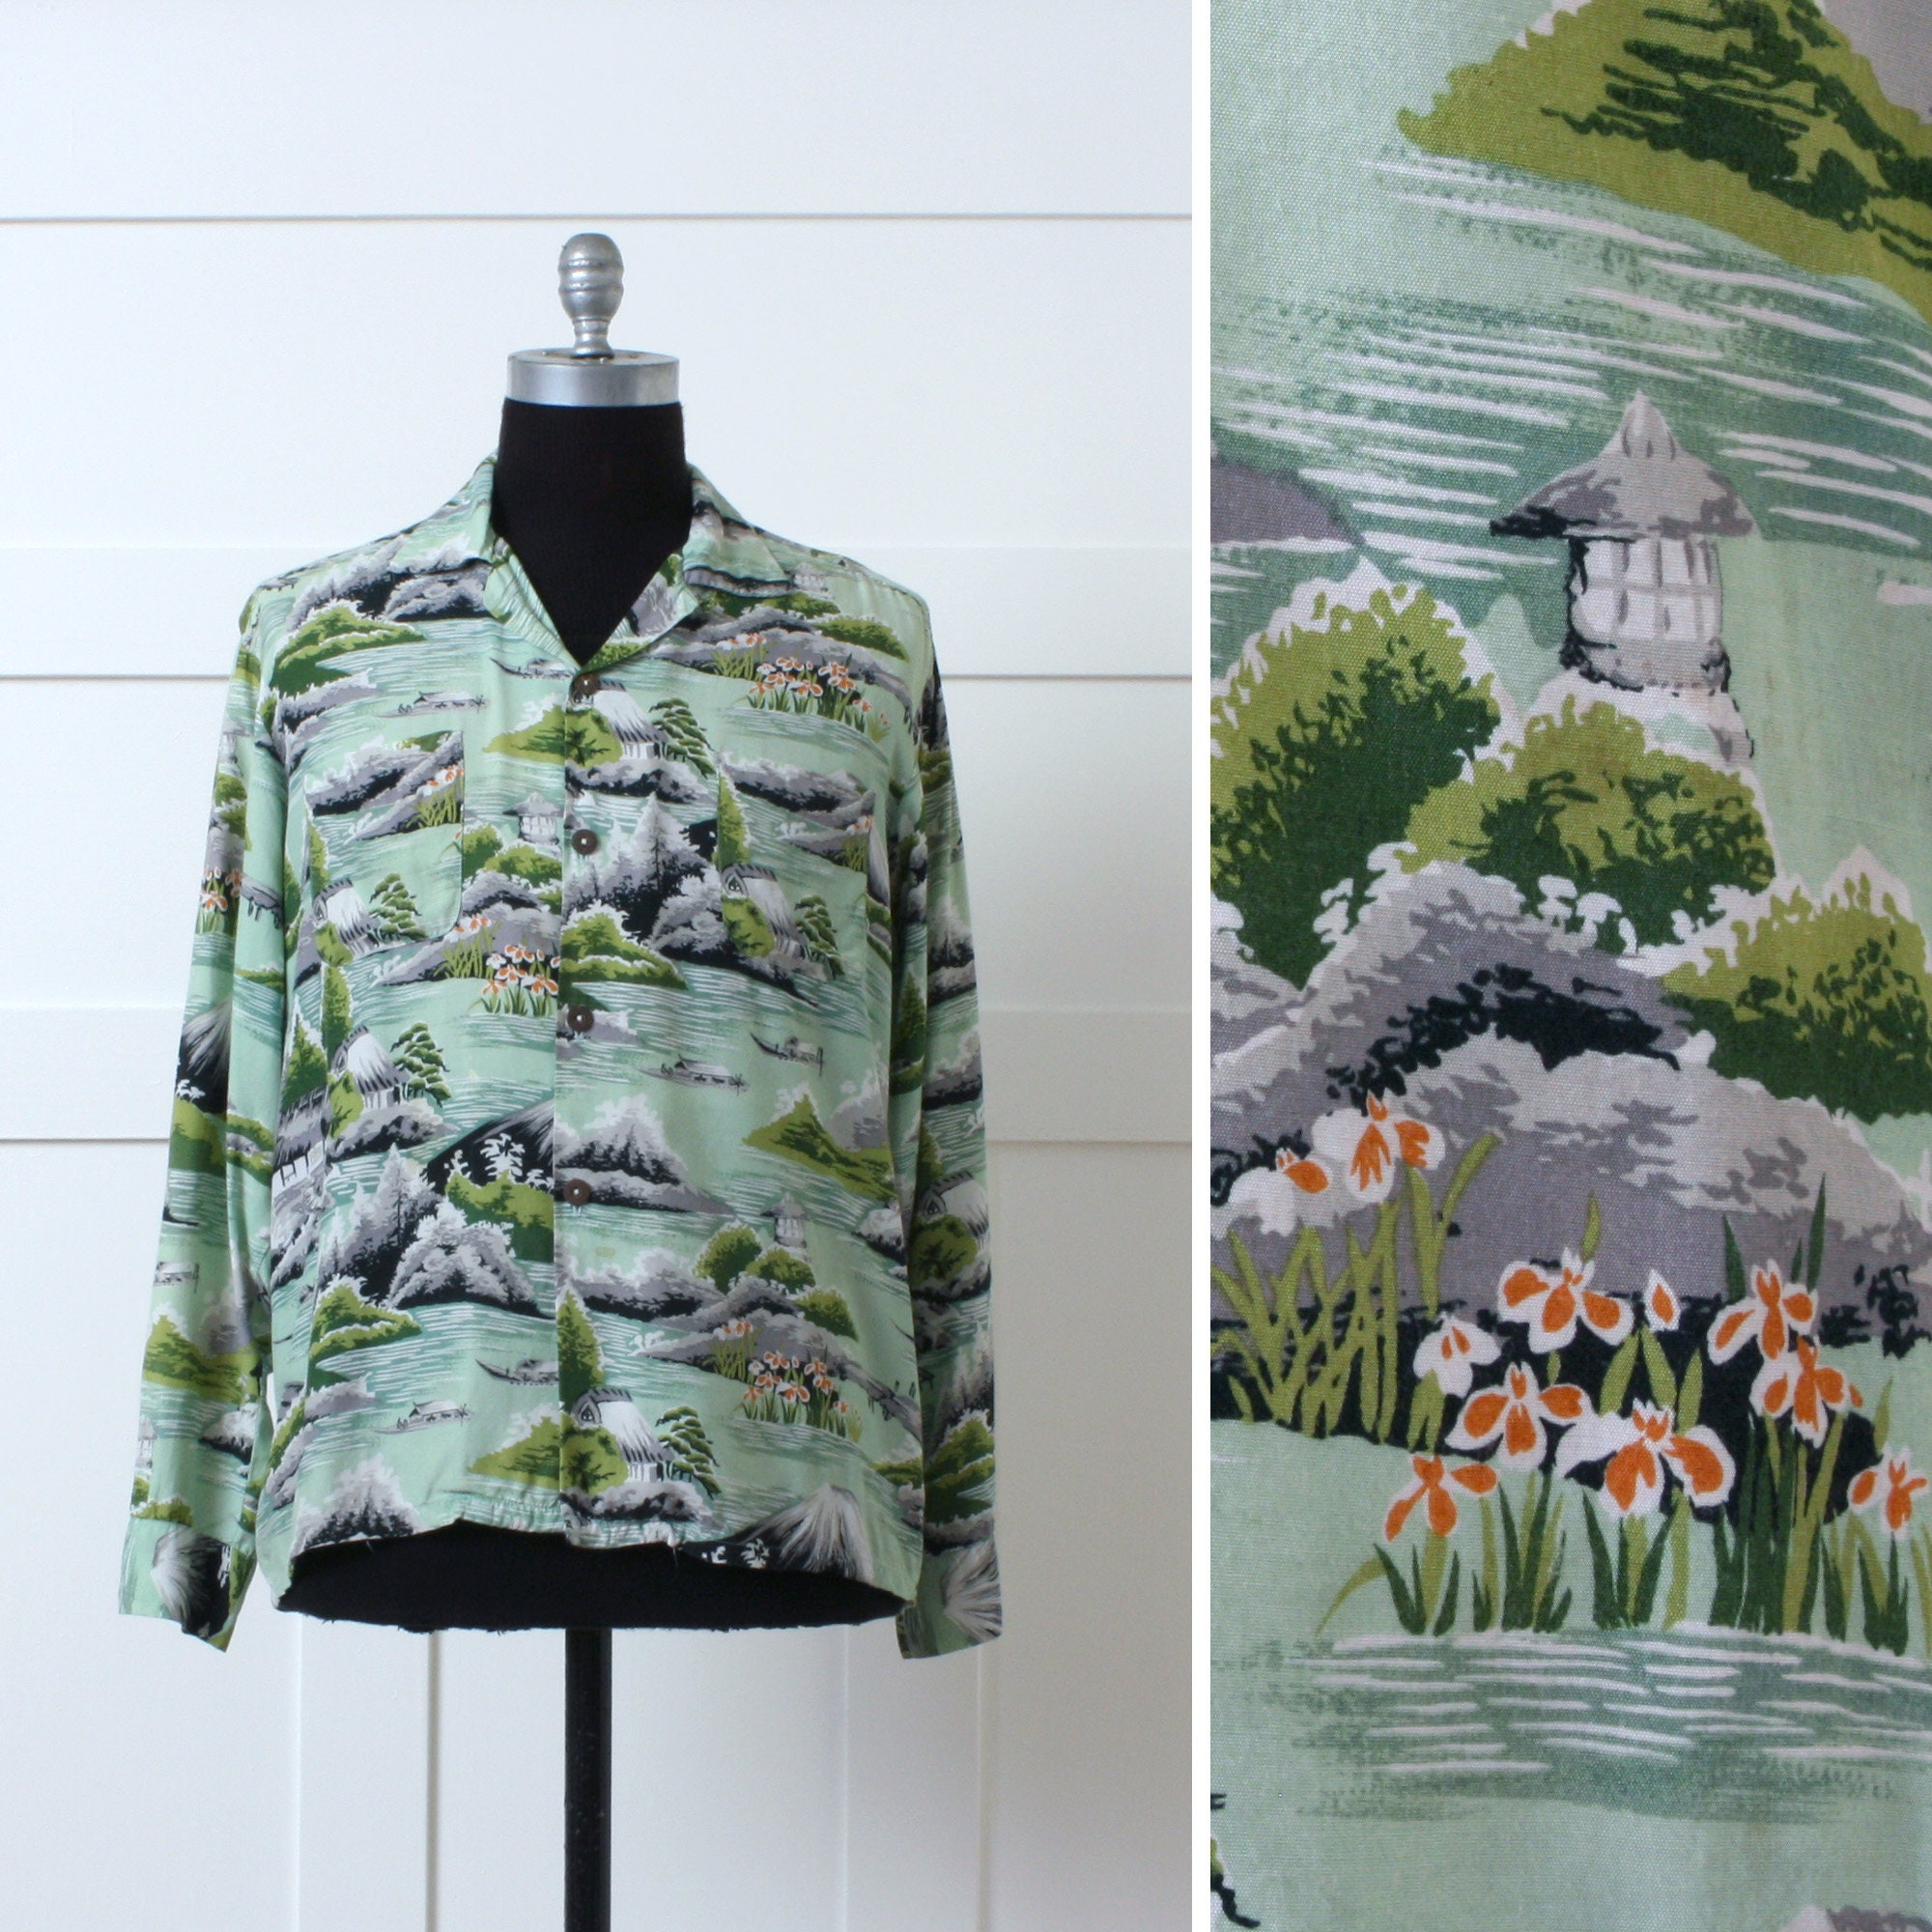 1970s Men's Shirt Styles – Vintage 70s Shirts for Guys Mens Vintage Rayon Hawaiian Shirt Long Sleeve Japanese Garden Print 1970S Reminiscence Stewart Richer $148.00 AT vintagedancer.com